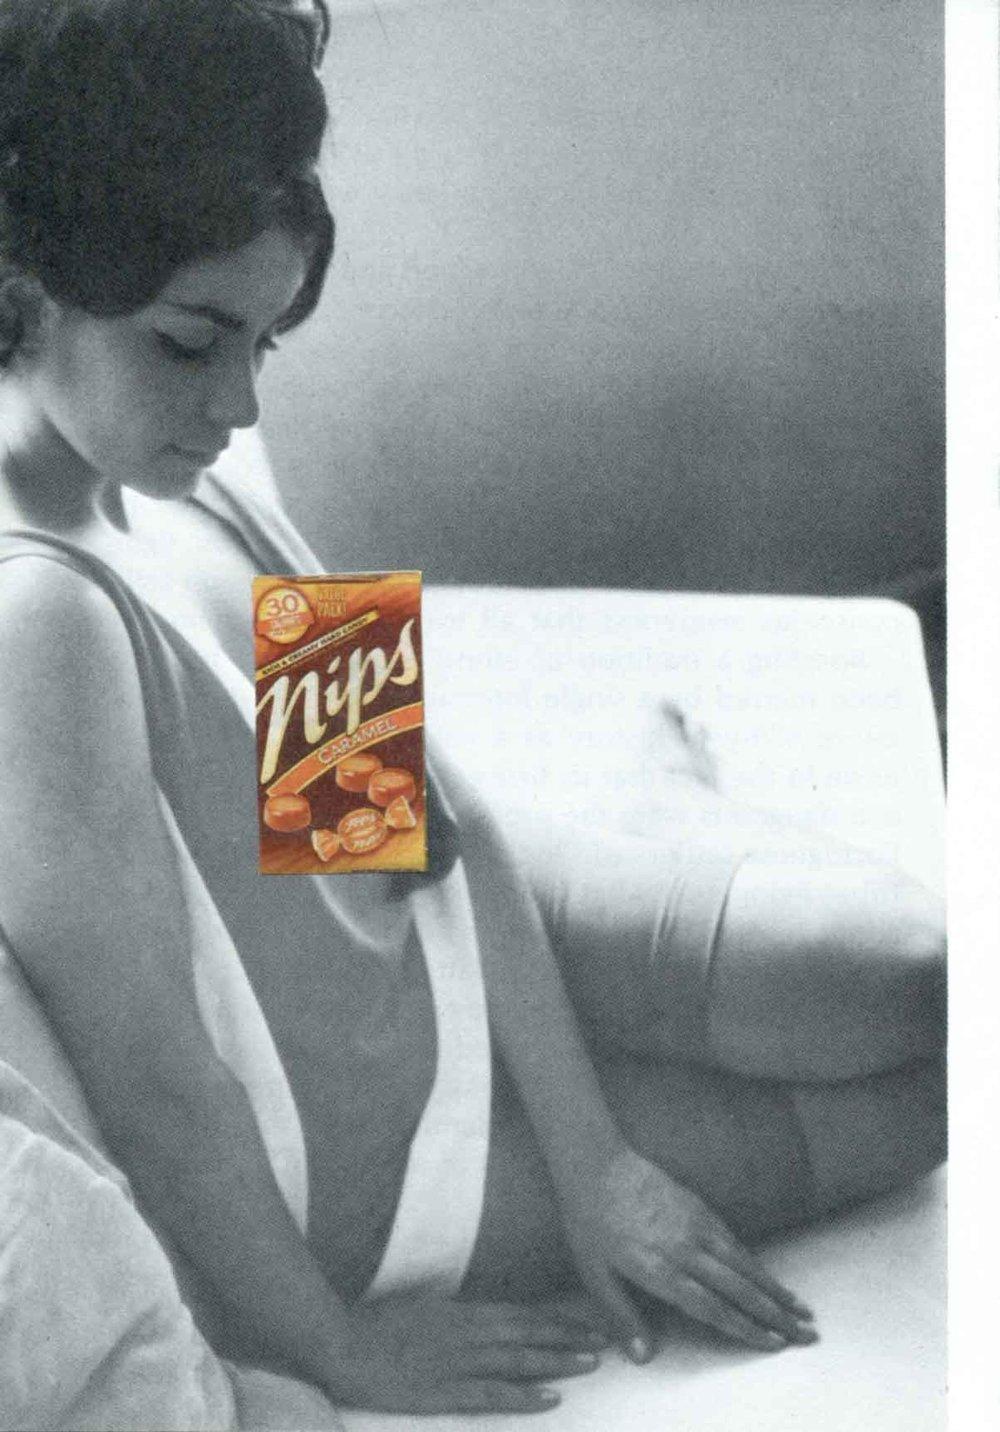 Caramel Nips